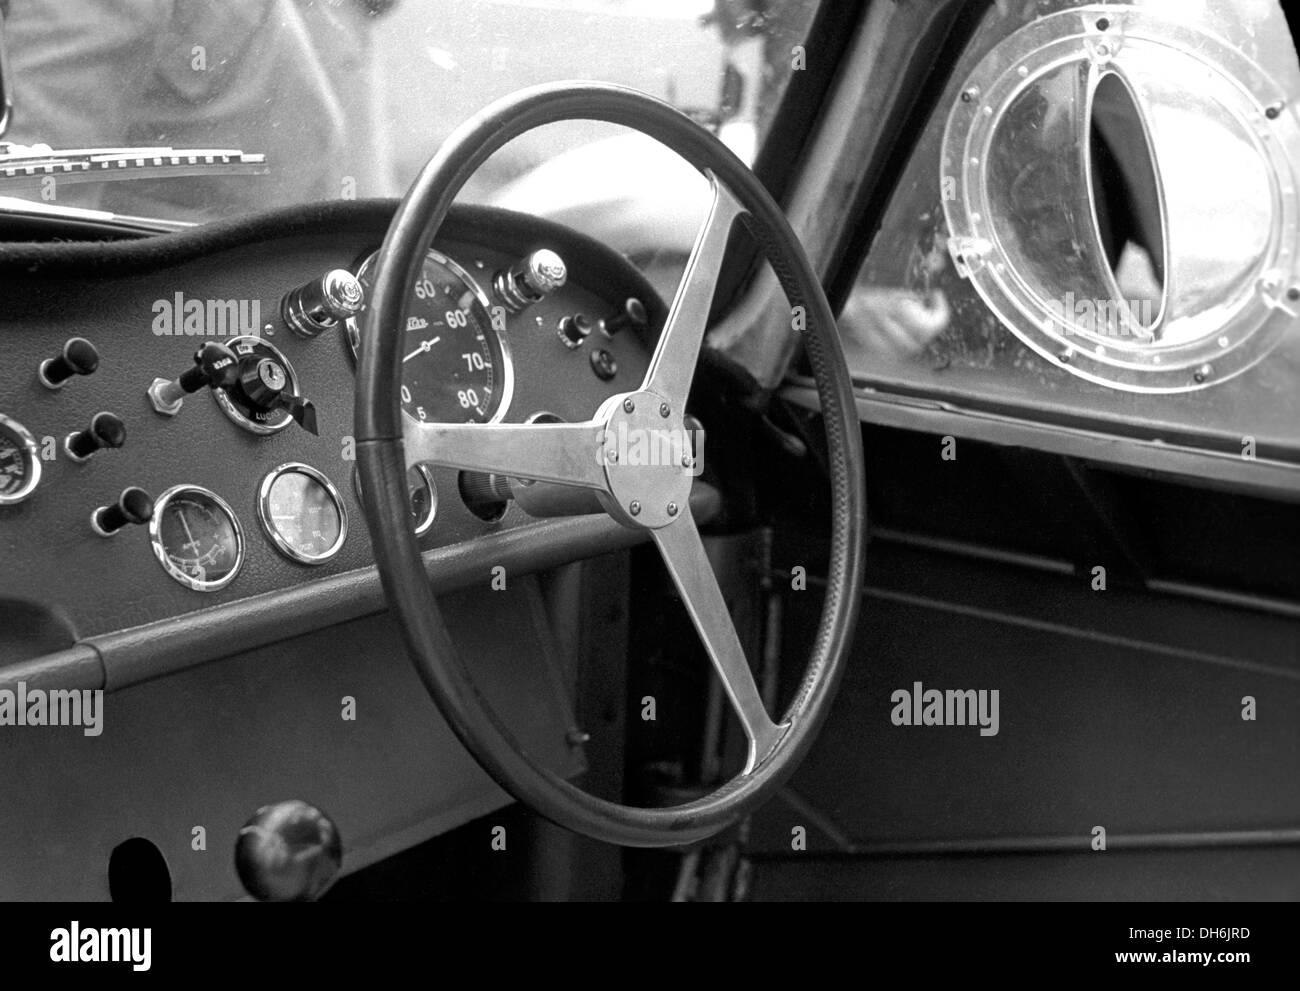 Innenraum eines Aston Martin DB3S Coupés in Silverstone, England 1954. Stockbild